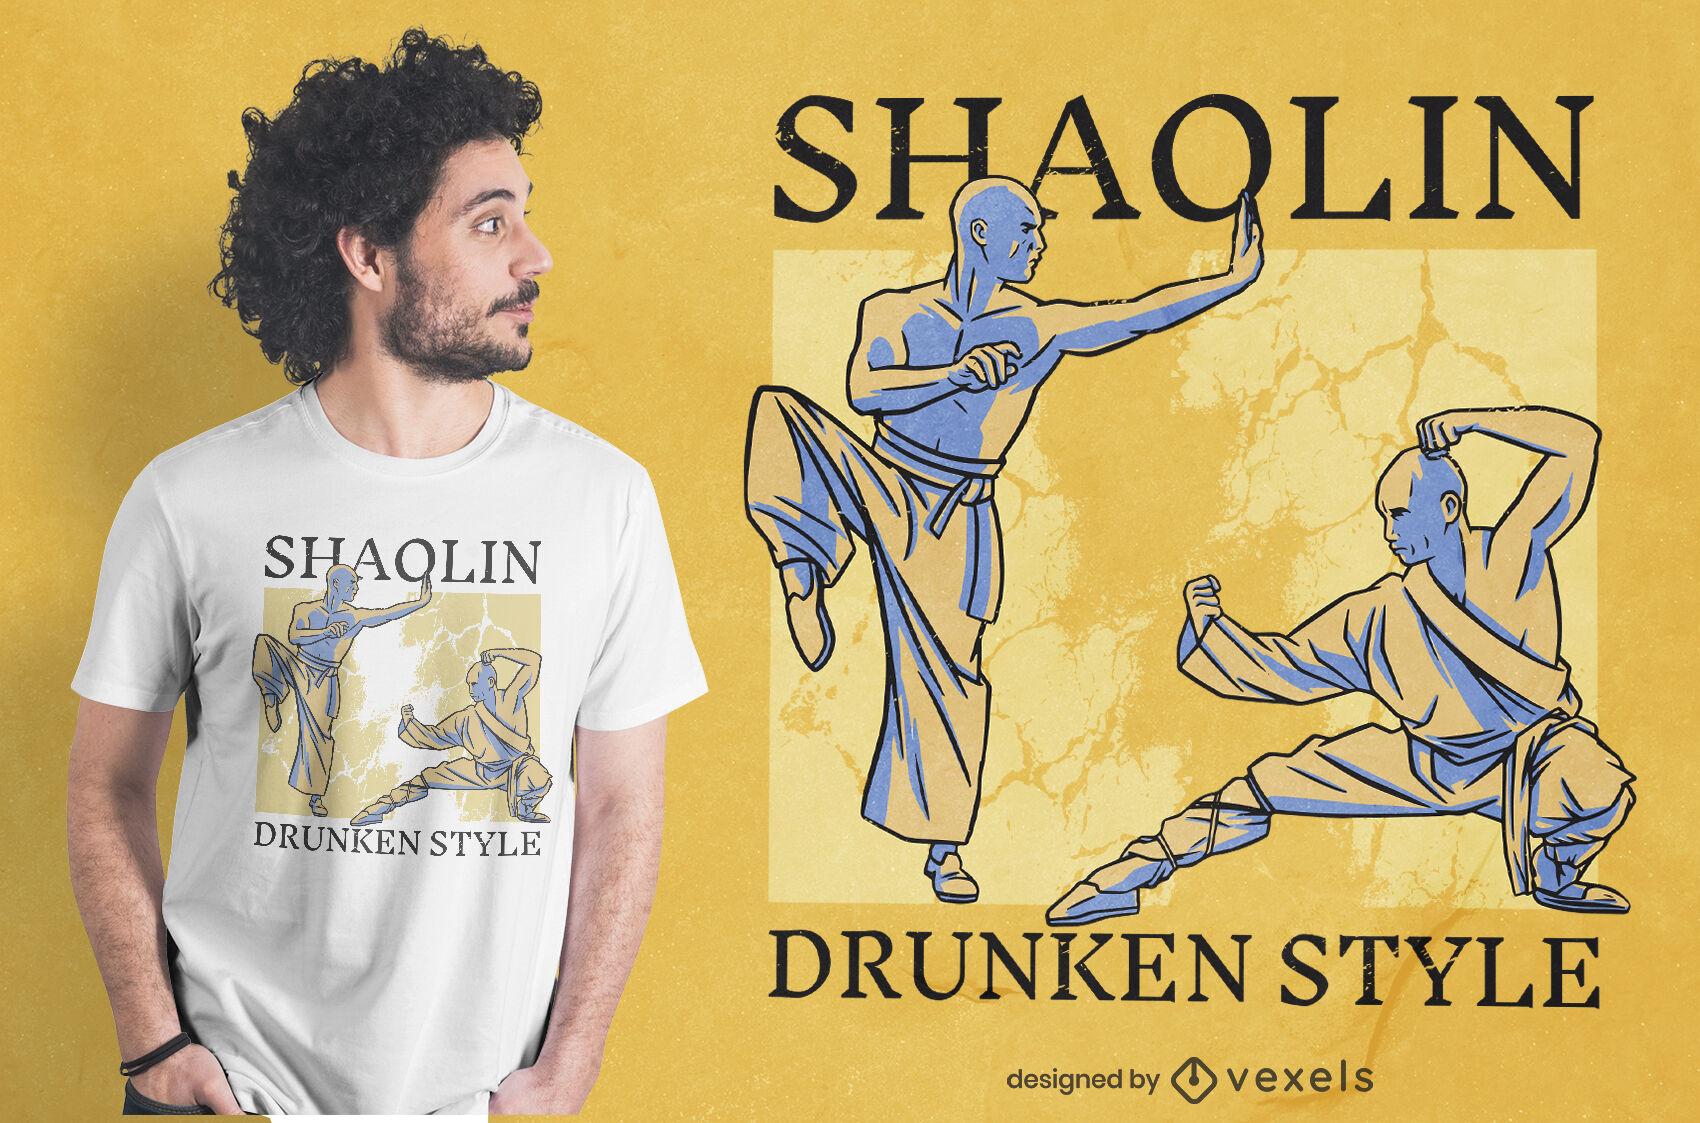 Drunken style shaolin t-shirt design